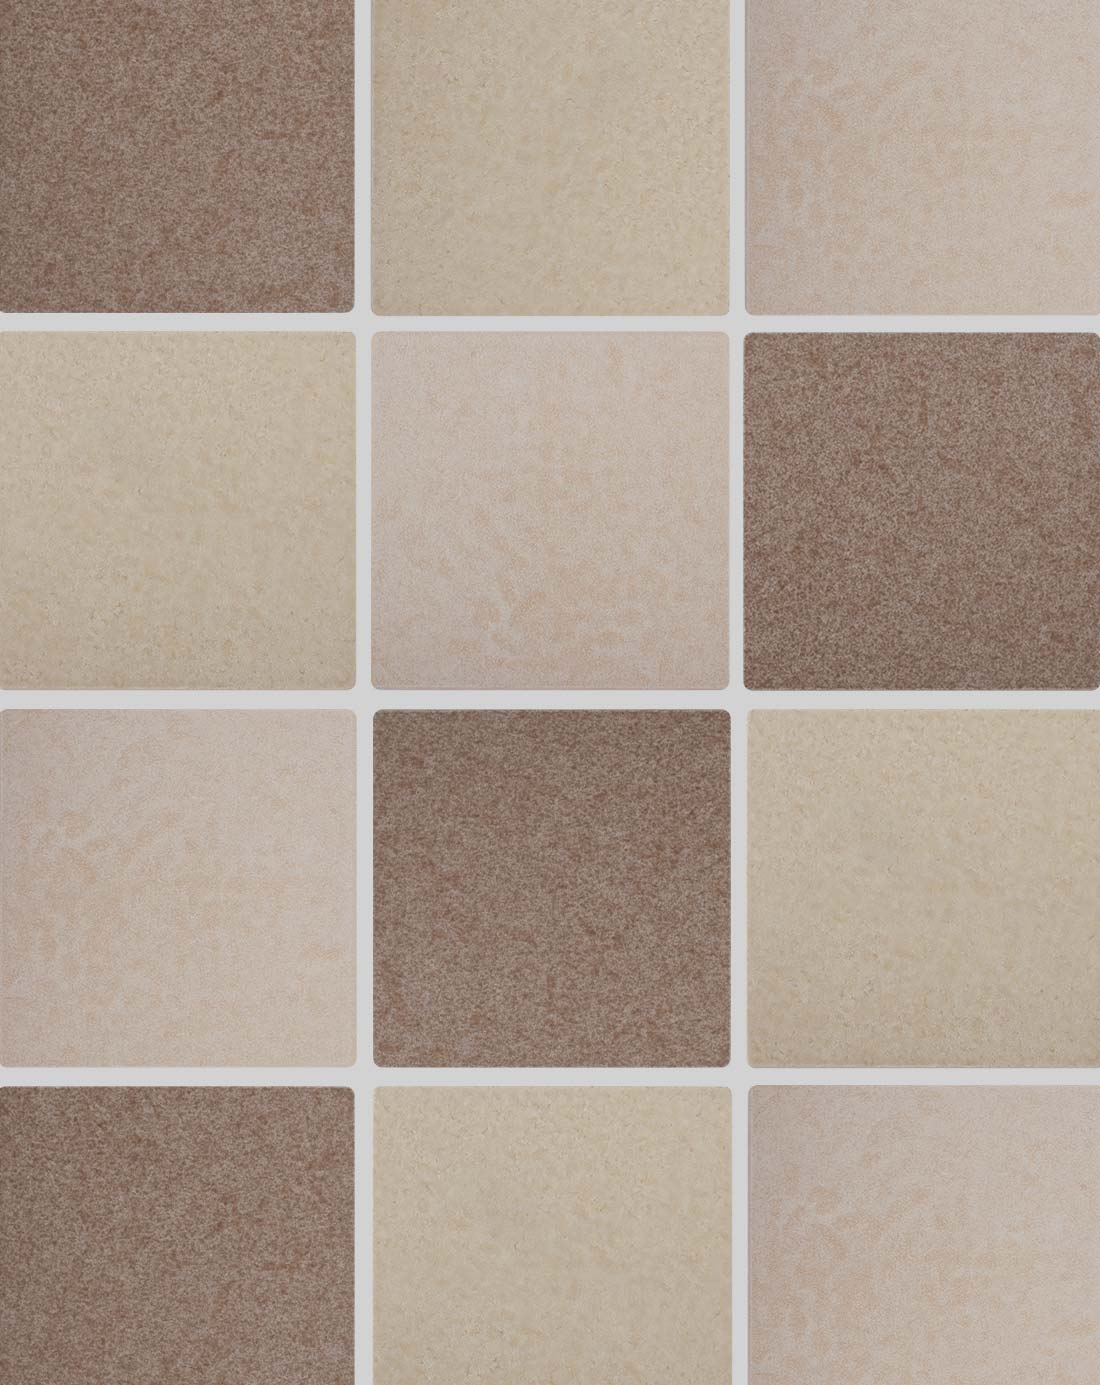 Beige Crema Chocolate North Pole Kitchen Wall Tiles 31 00m2